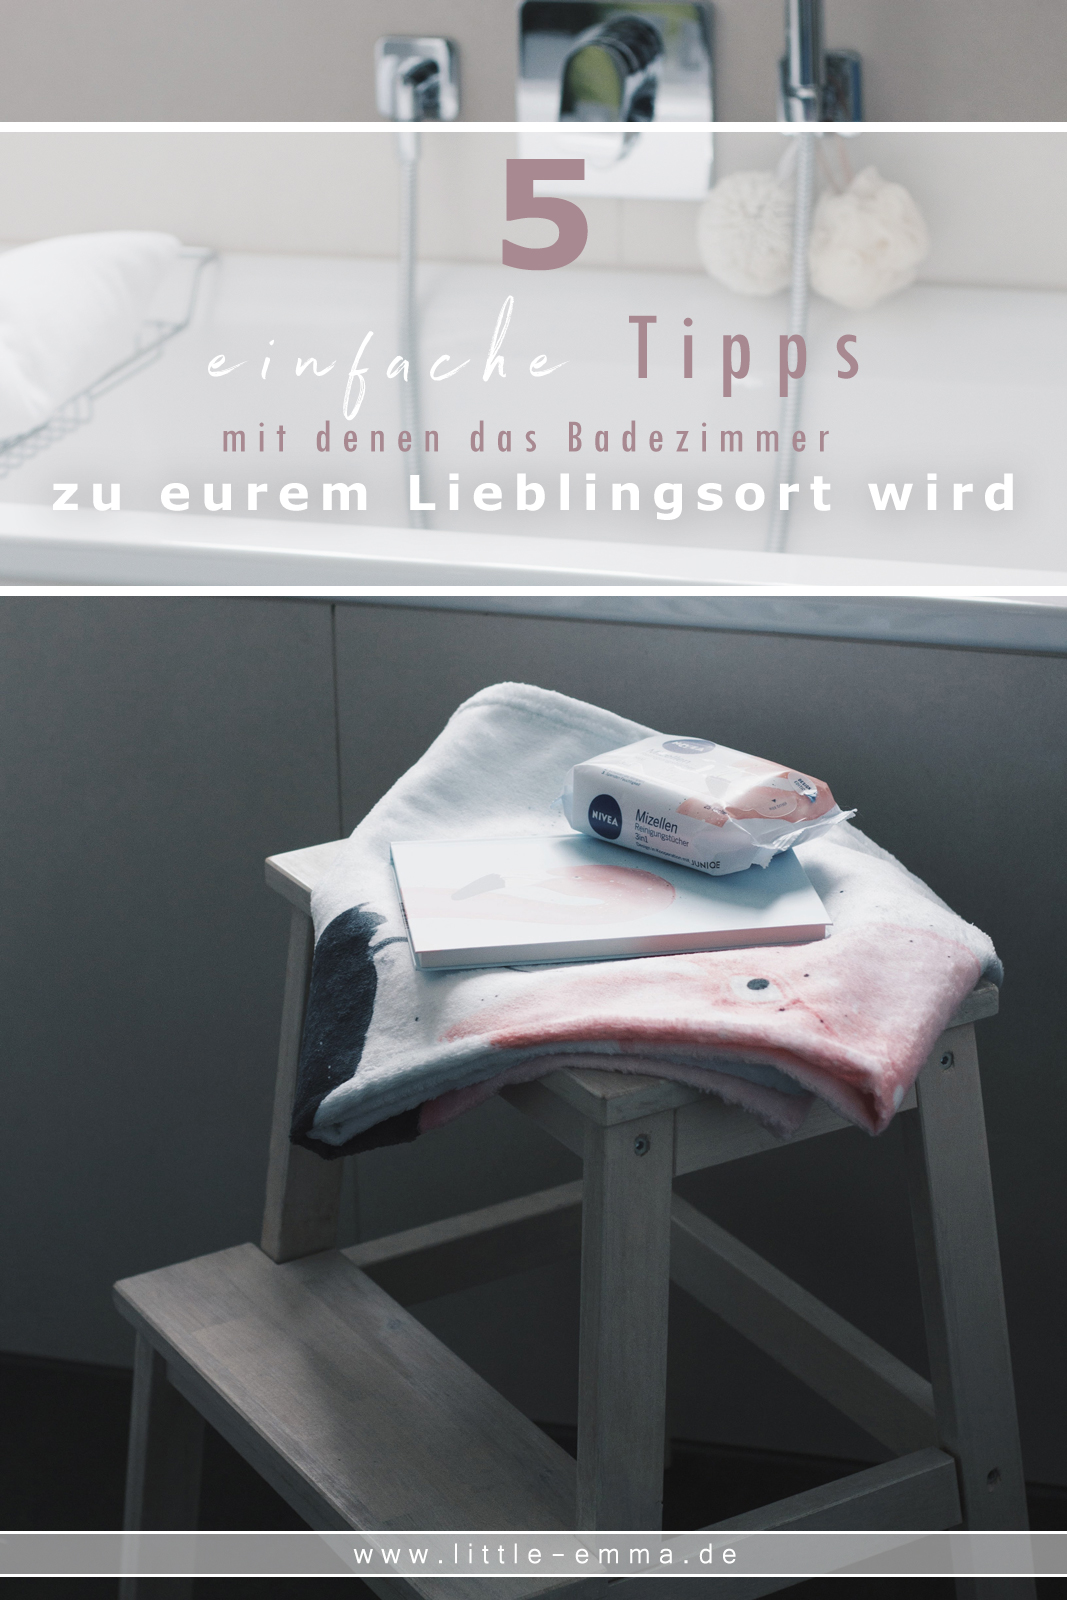 Badezimmer 5 Tipps Wohlfühloase Nivea Mizellen Reinigungstücher Juniqe Badetuch Duschvorhang Blog Deutschland Influencer Blogger Beauty